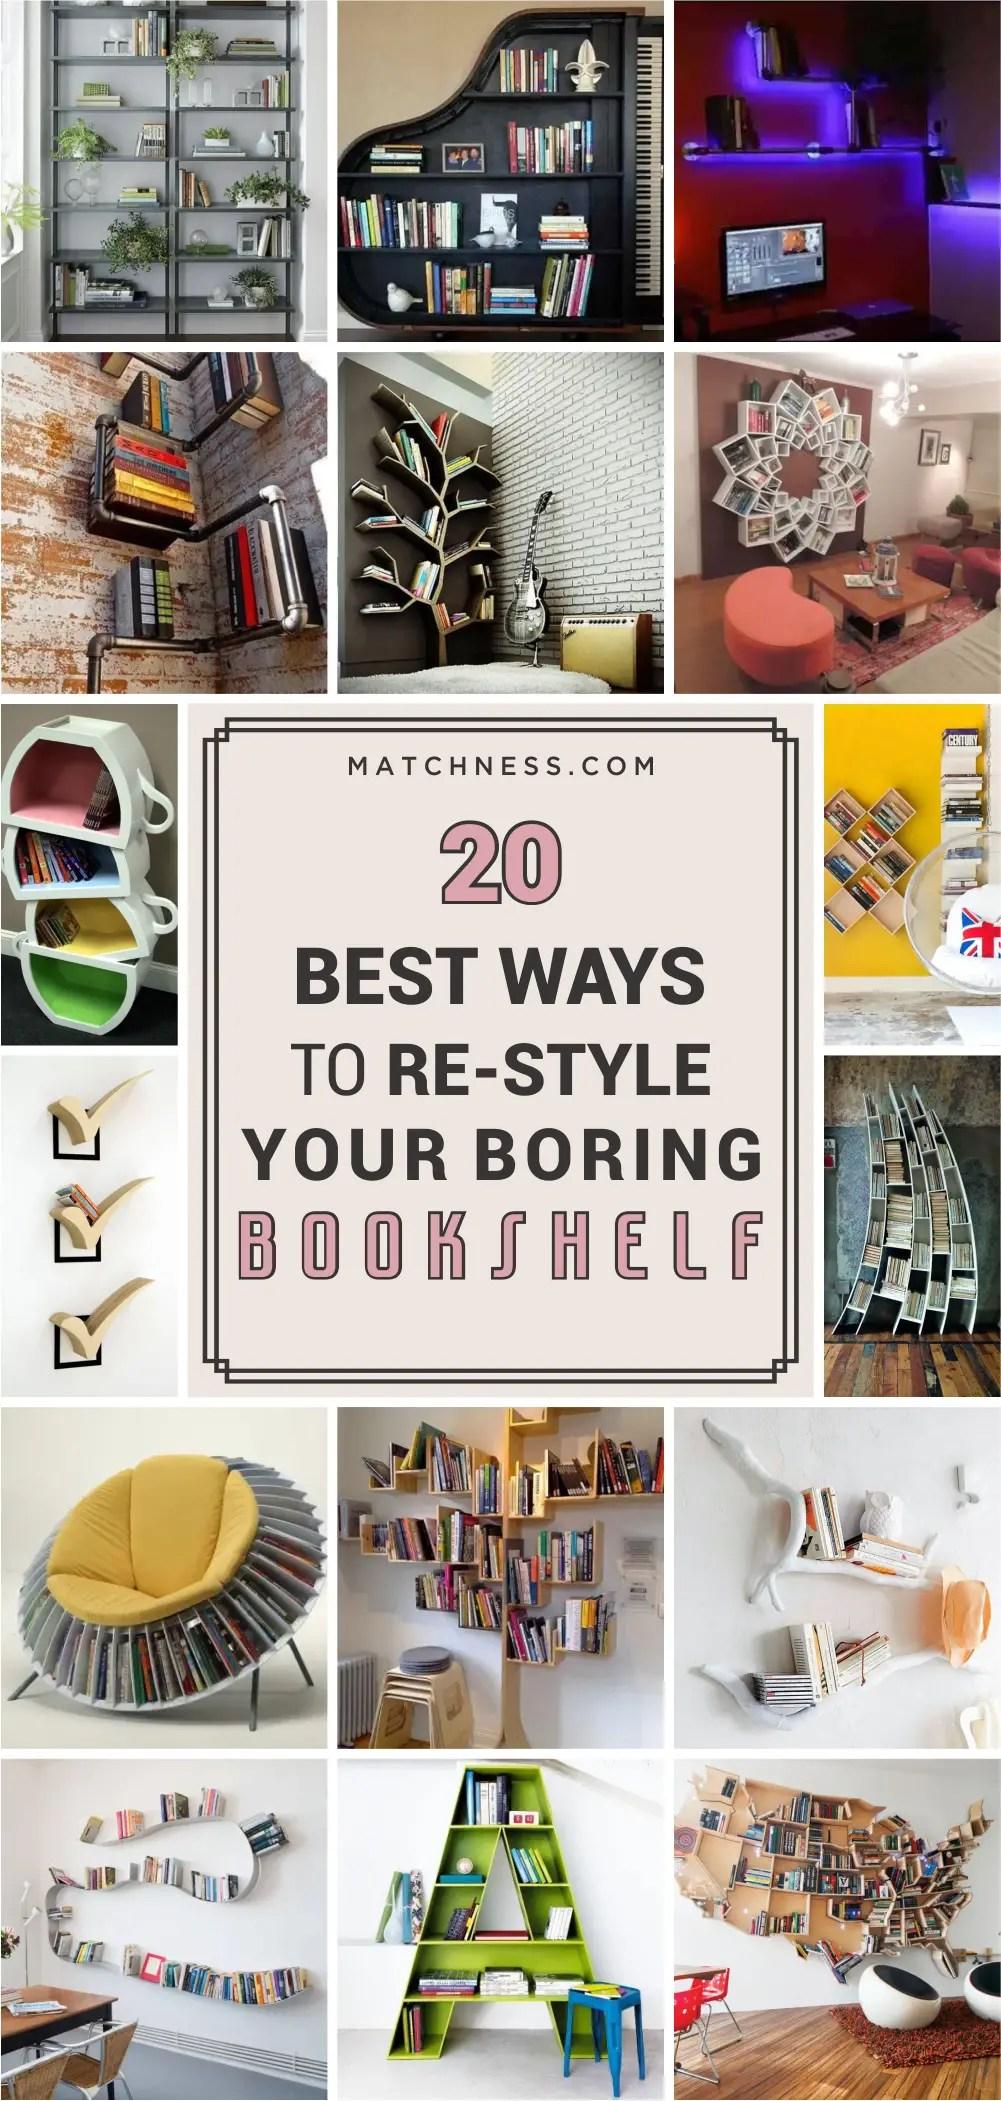 20-best-ways-to-re-style-your-boring-bookshelf-1